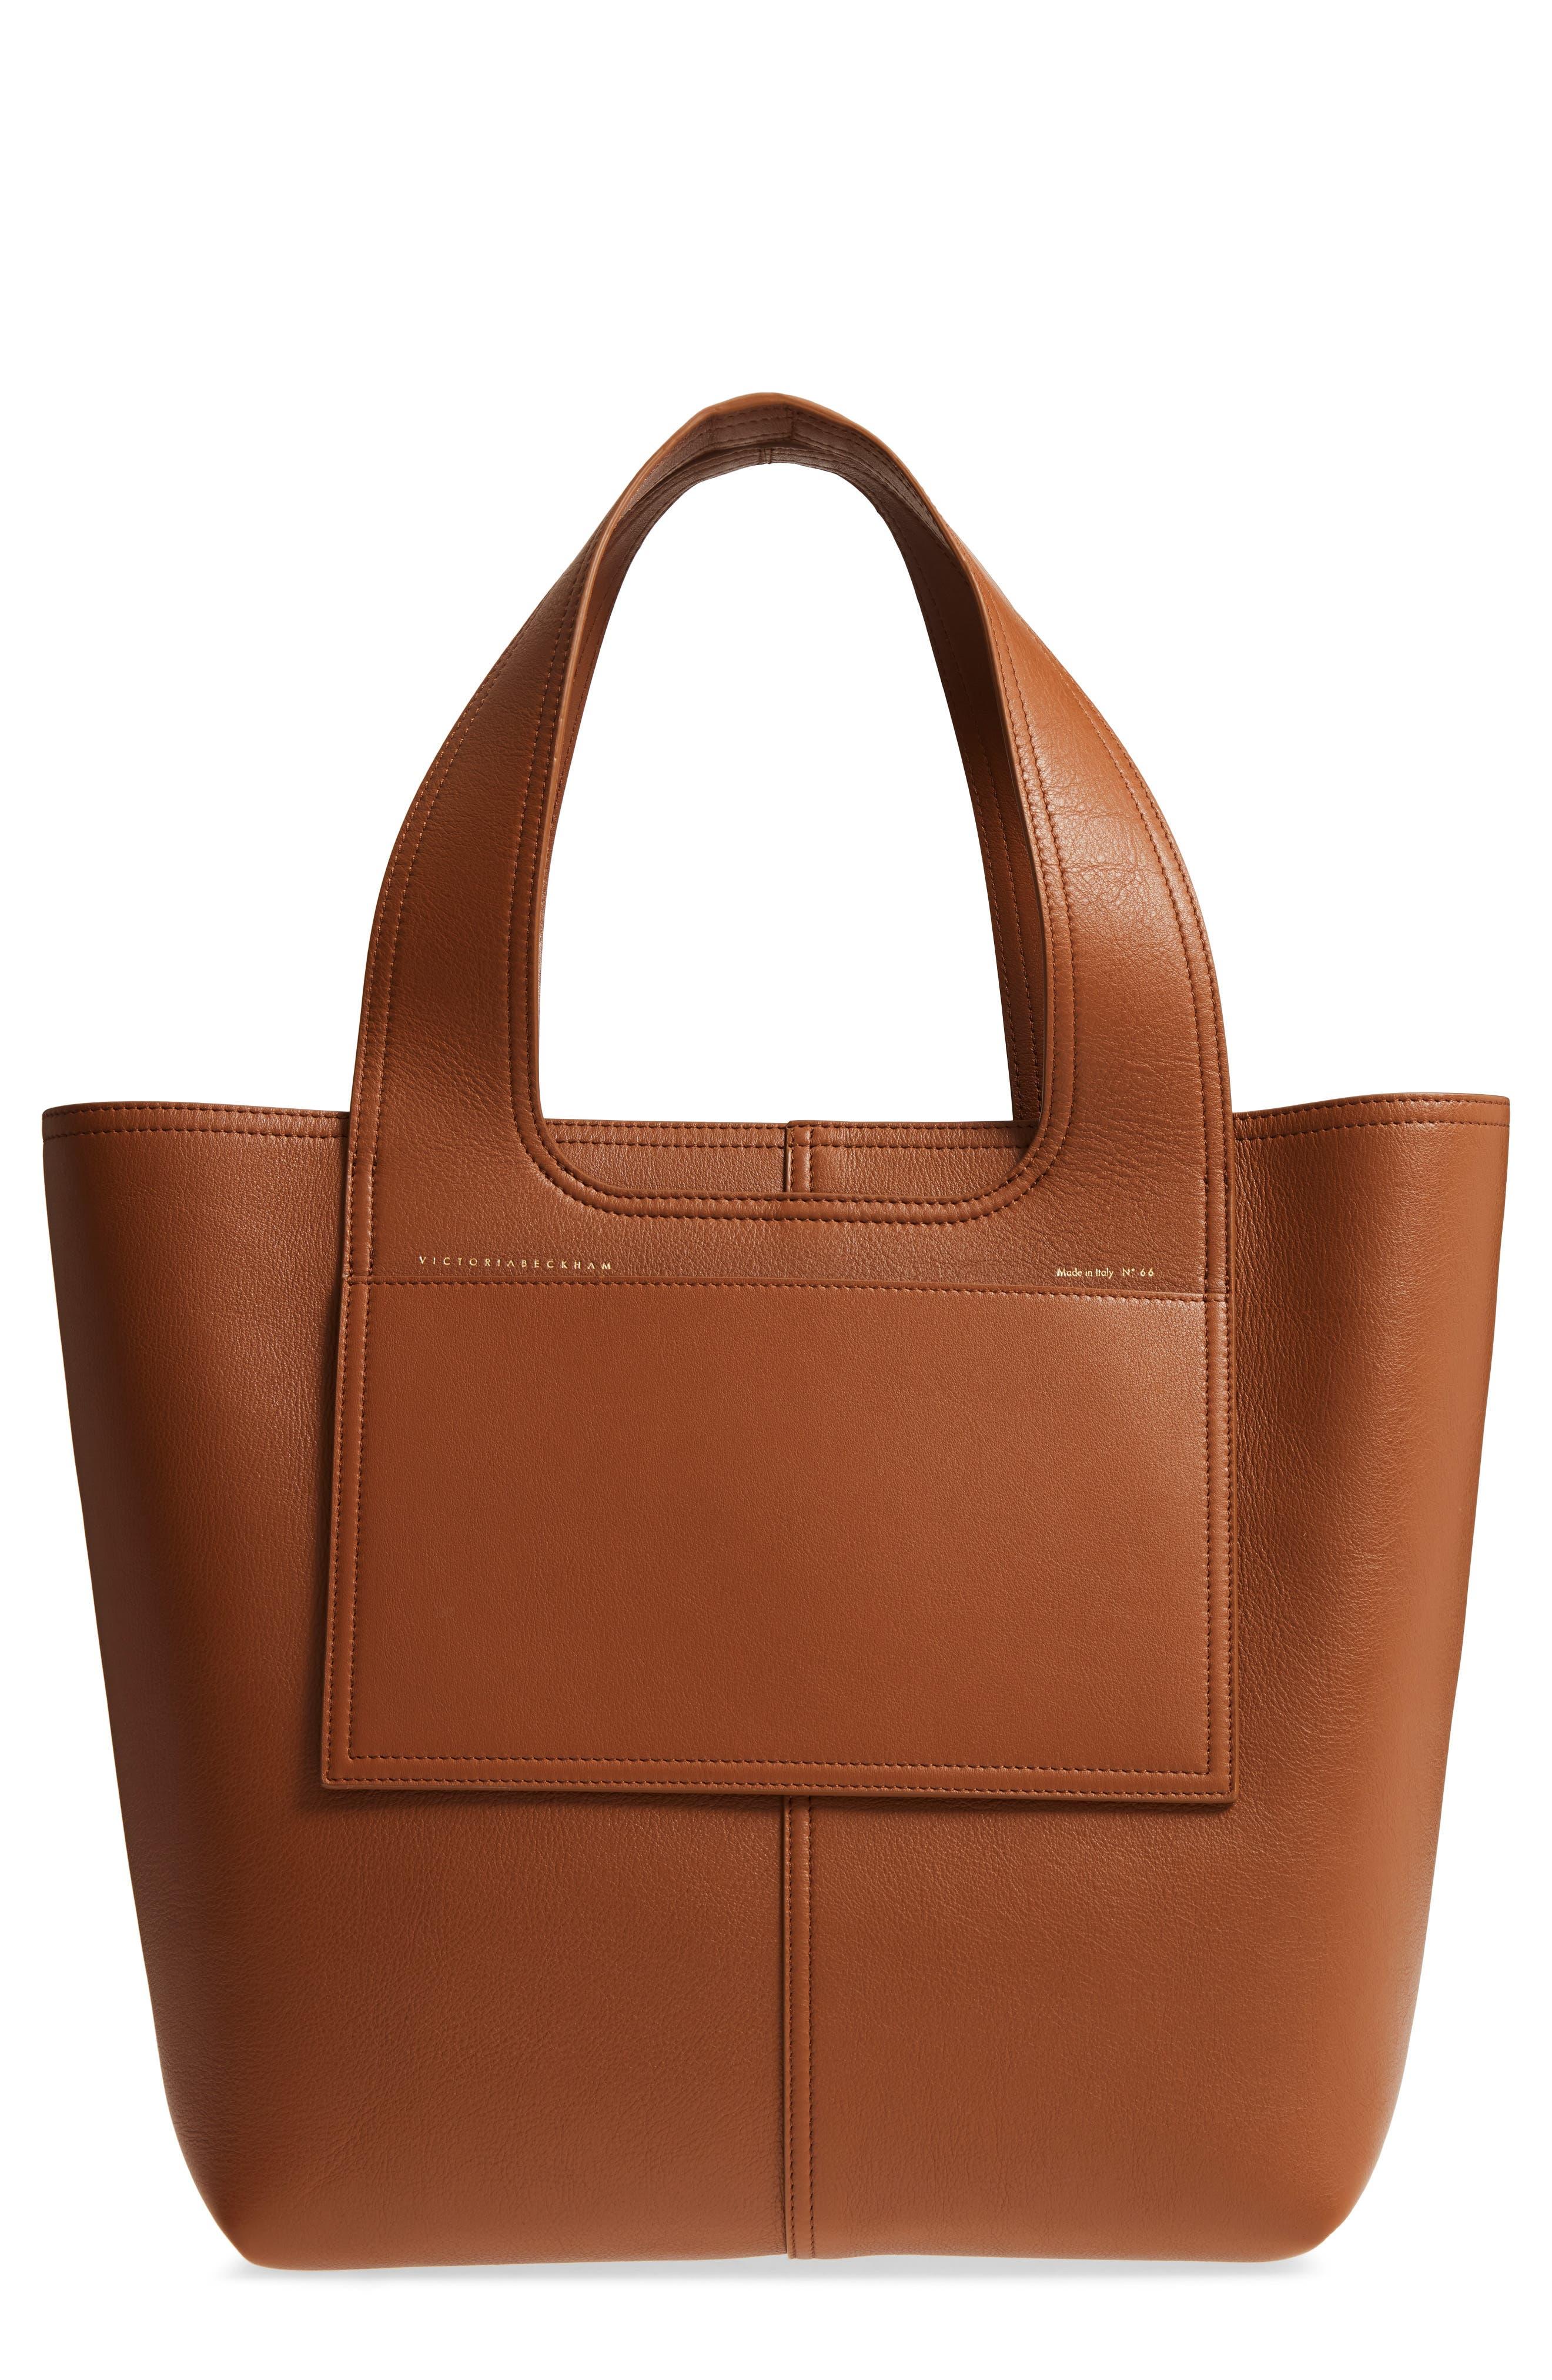 Apron Leather Tote,                         Main,                         color, Cuoio